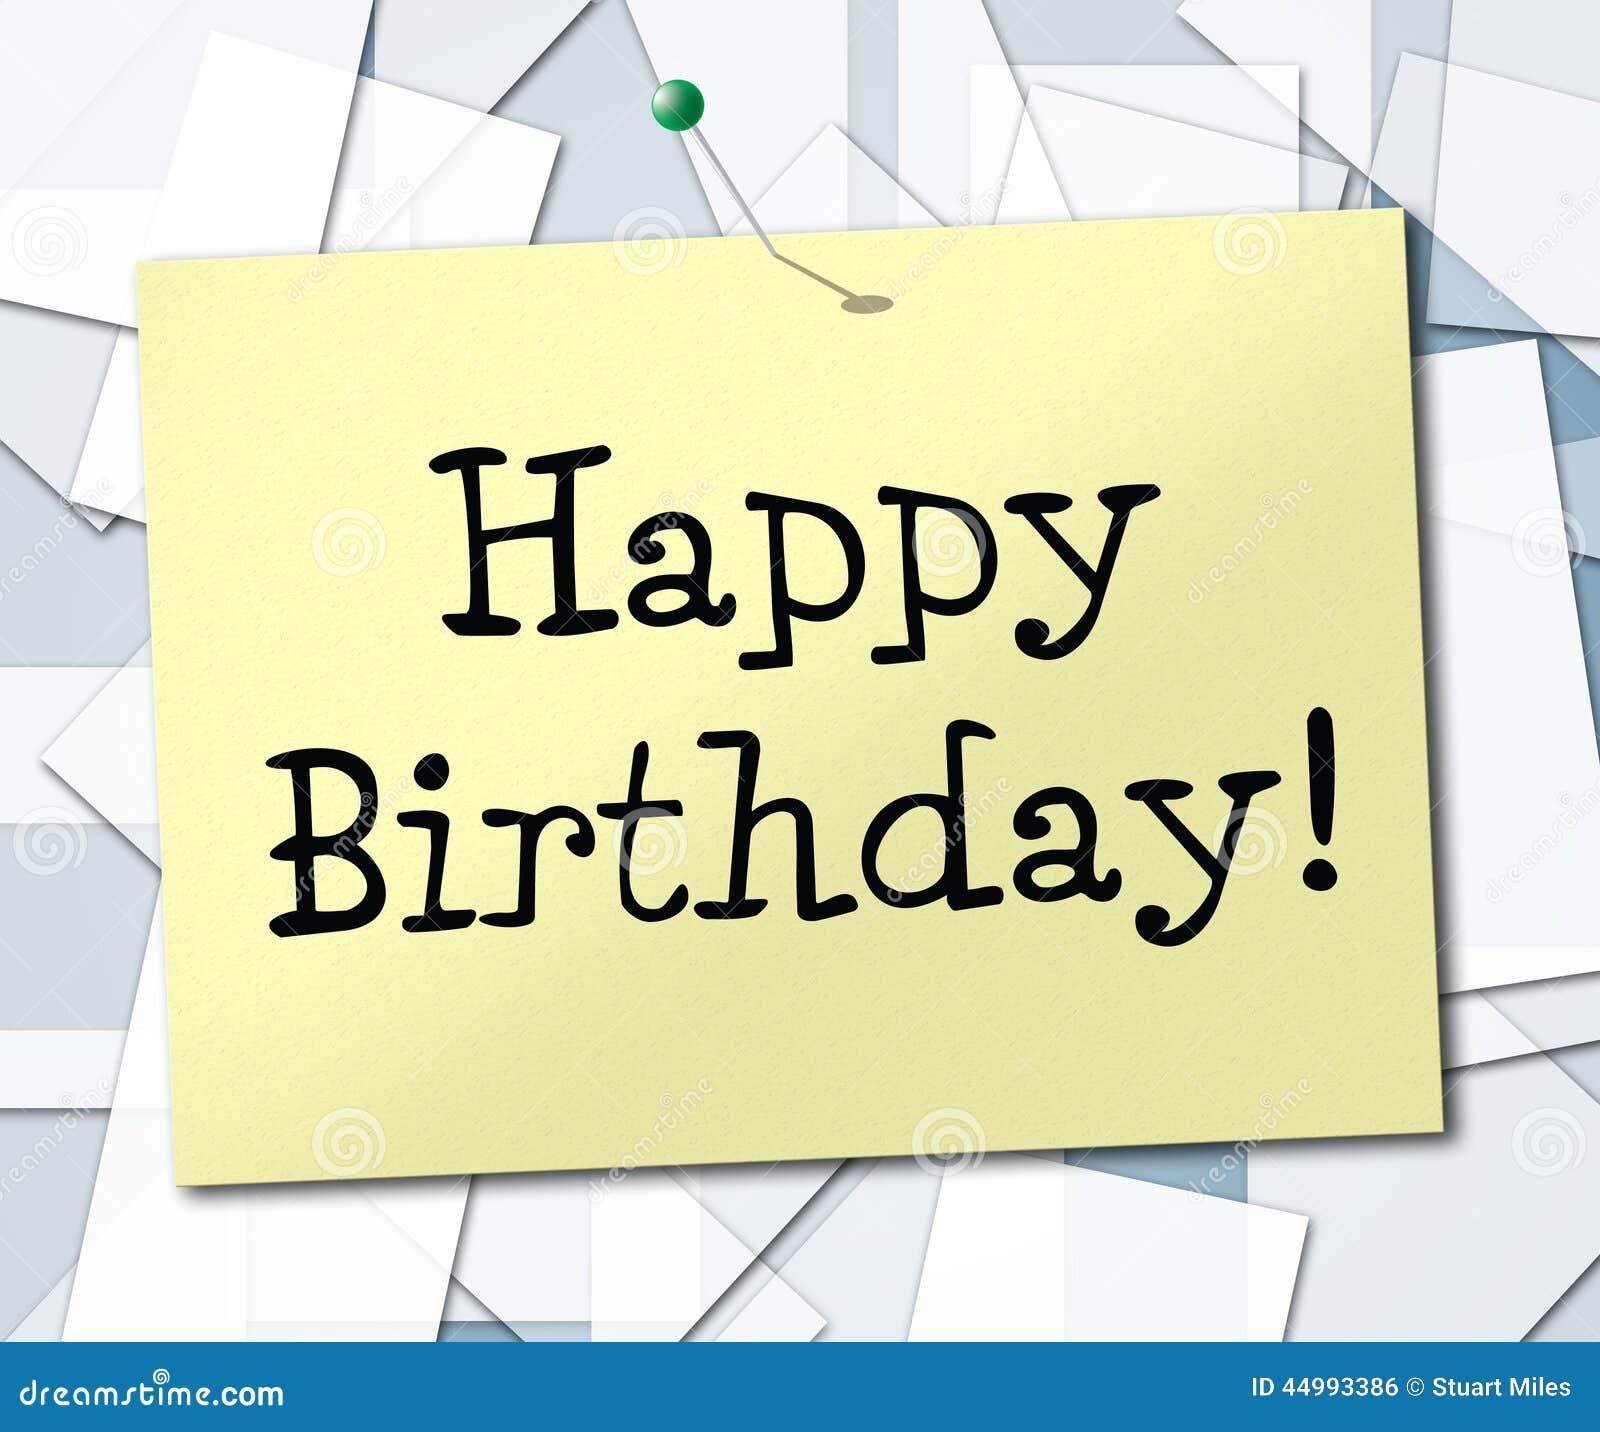 Happy Birthday Represents Greetings Celebrating And